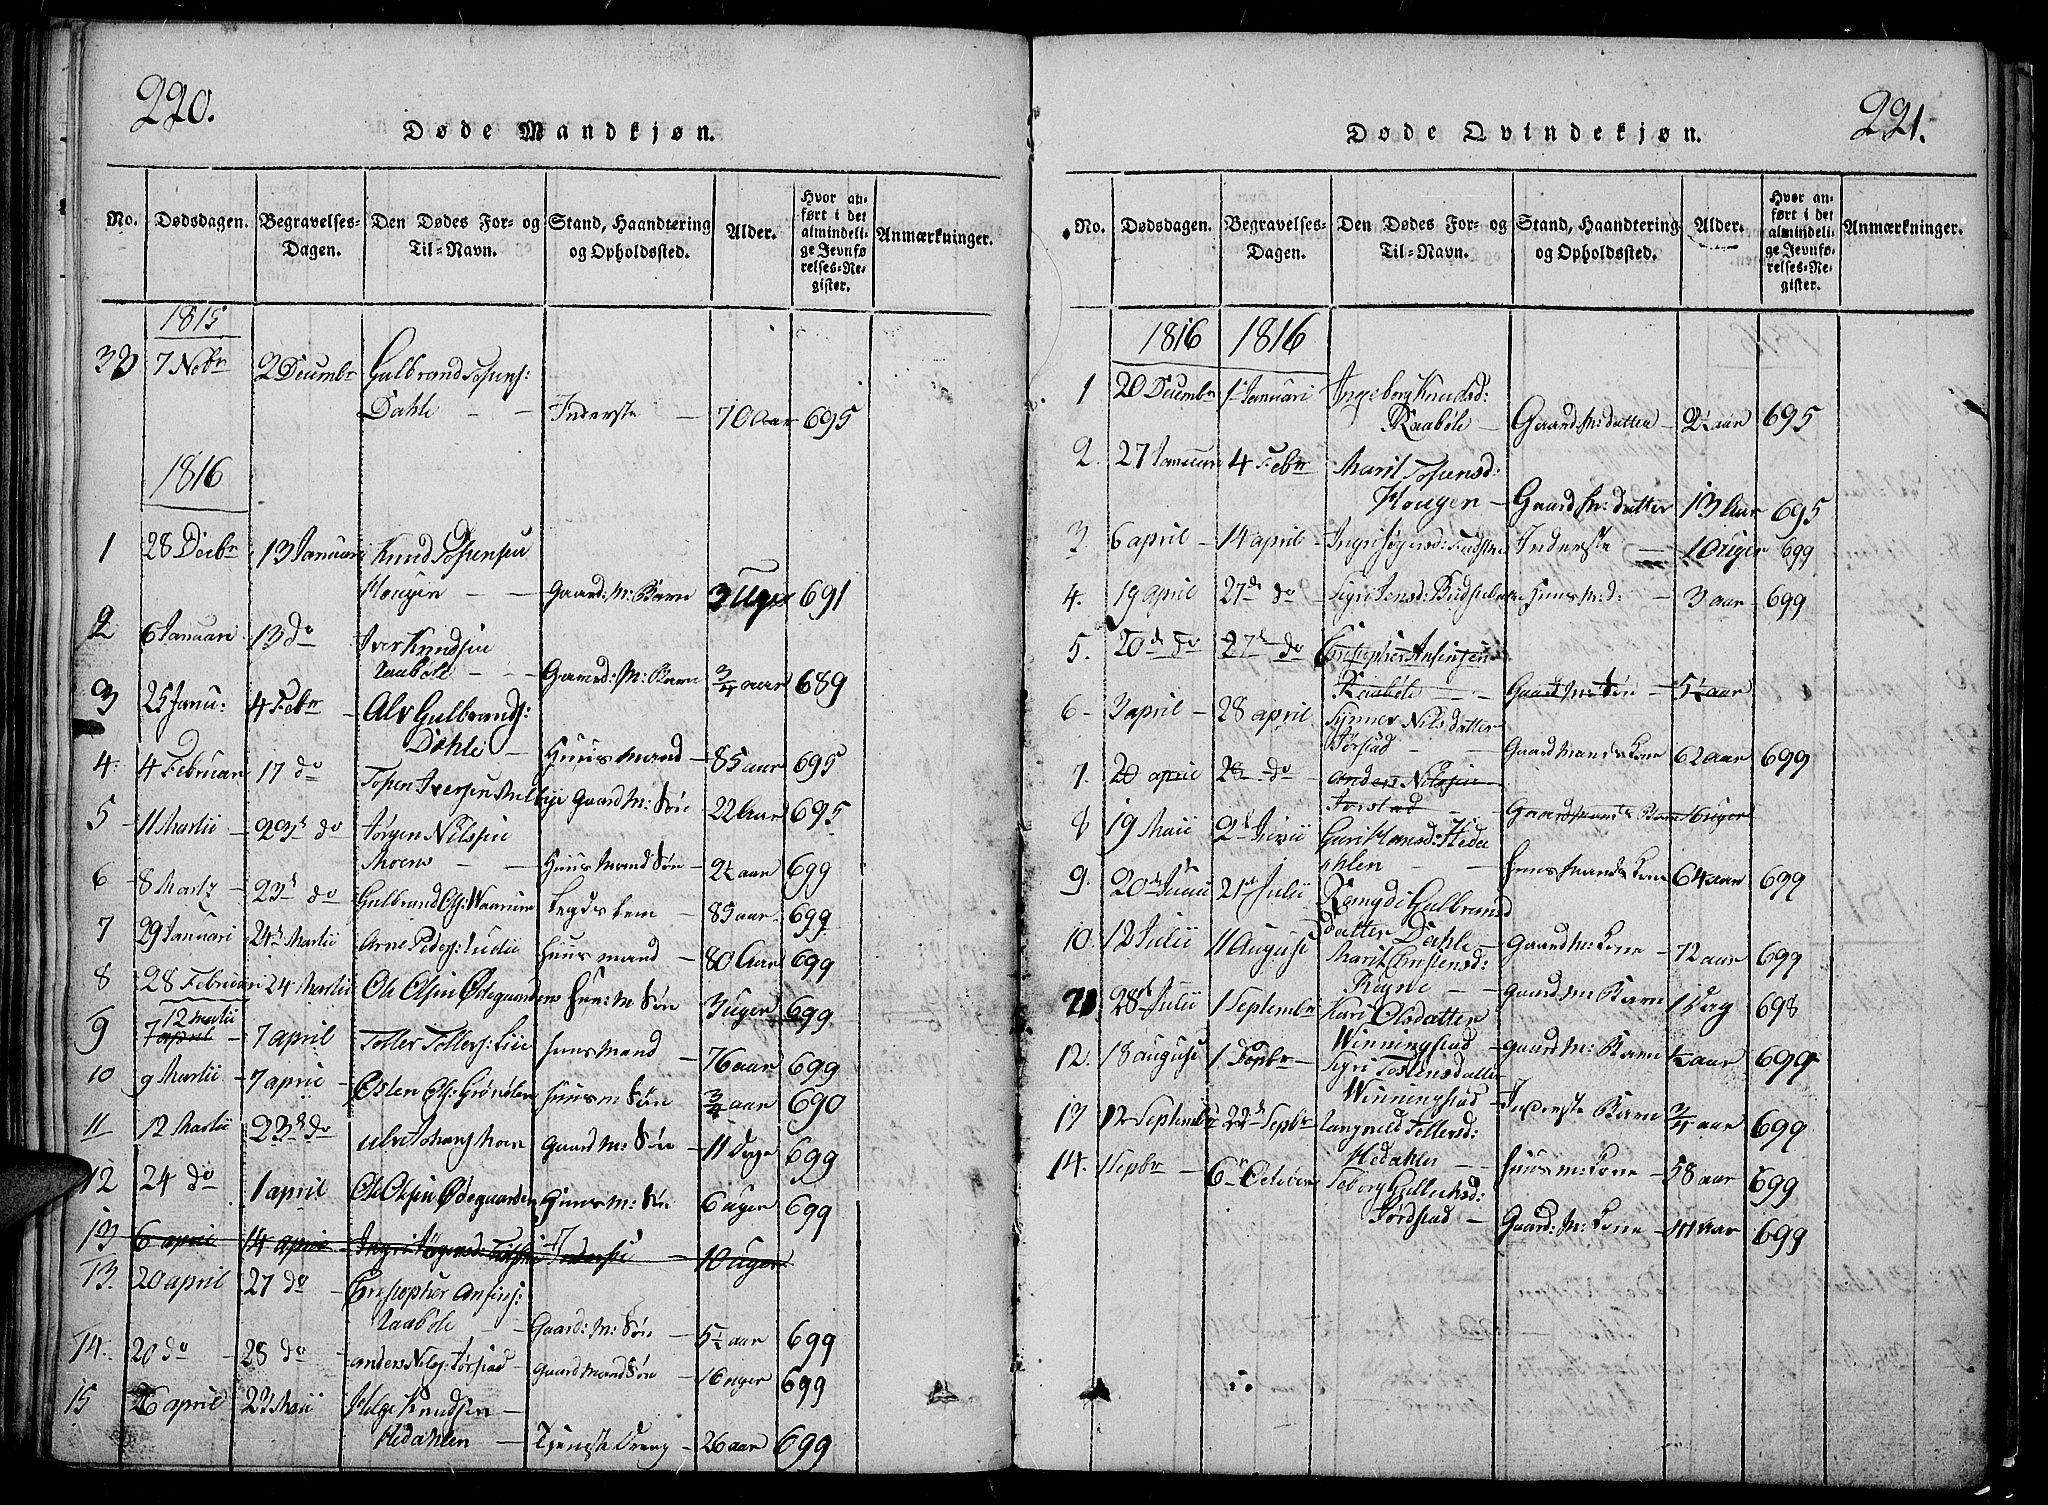 SAH, Slidre prestekontor, Klokkerbok nr. 2, 1814-1839, s. 220-221